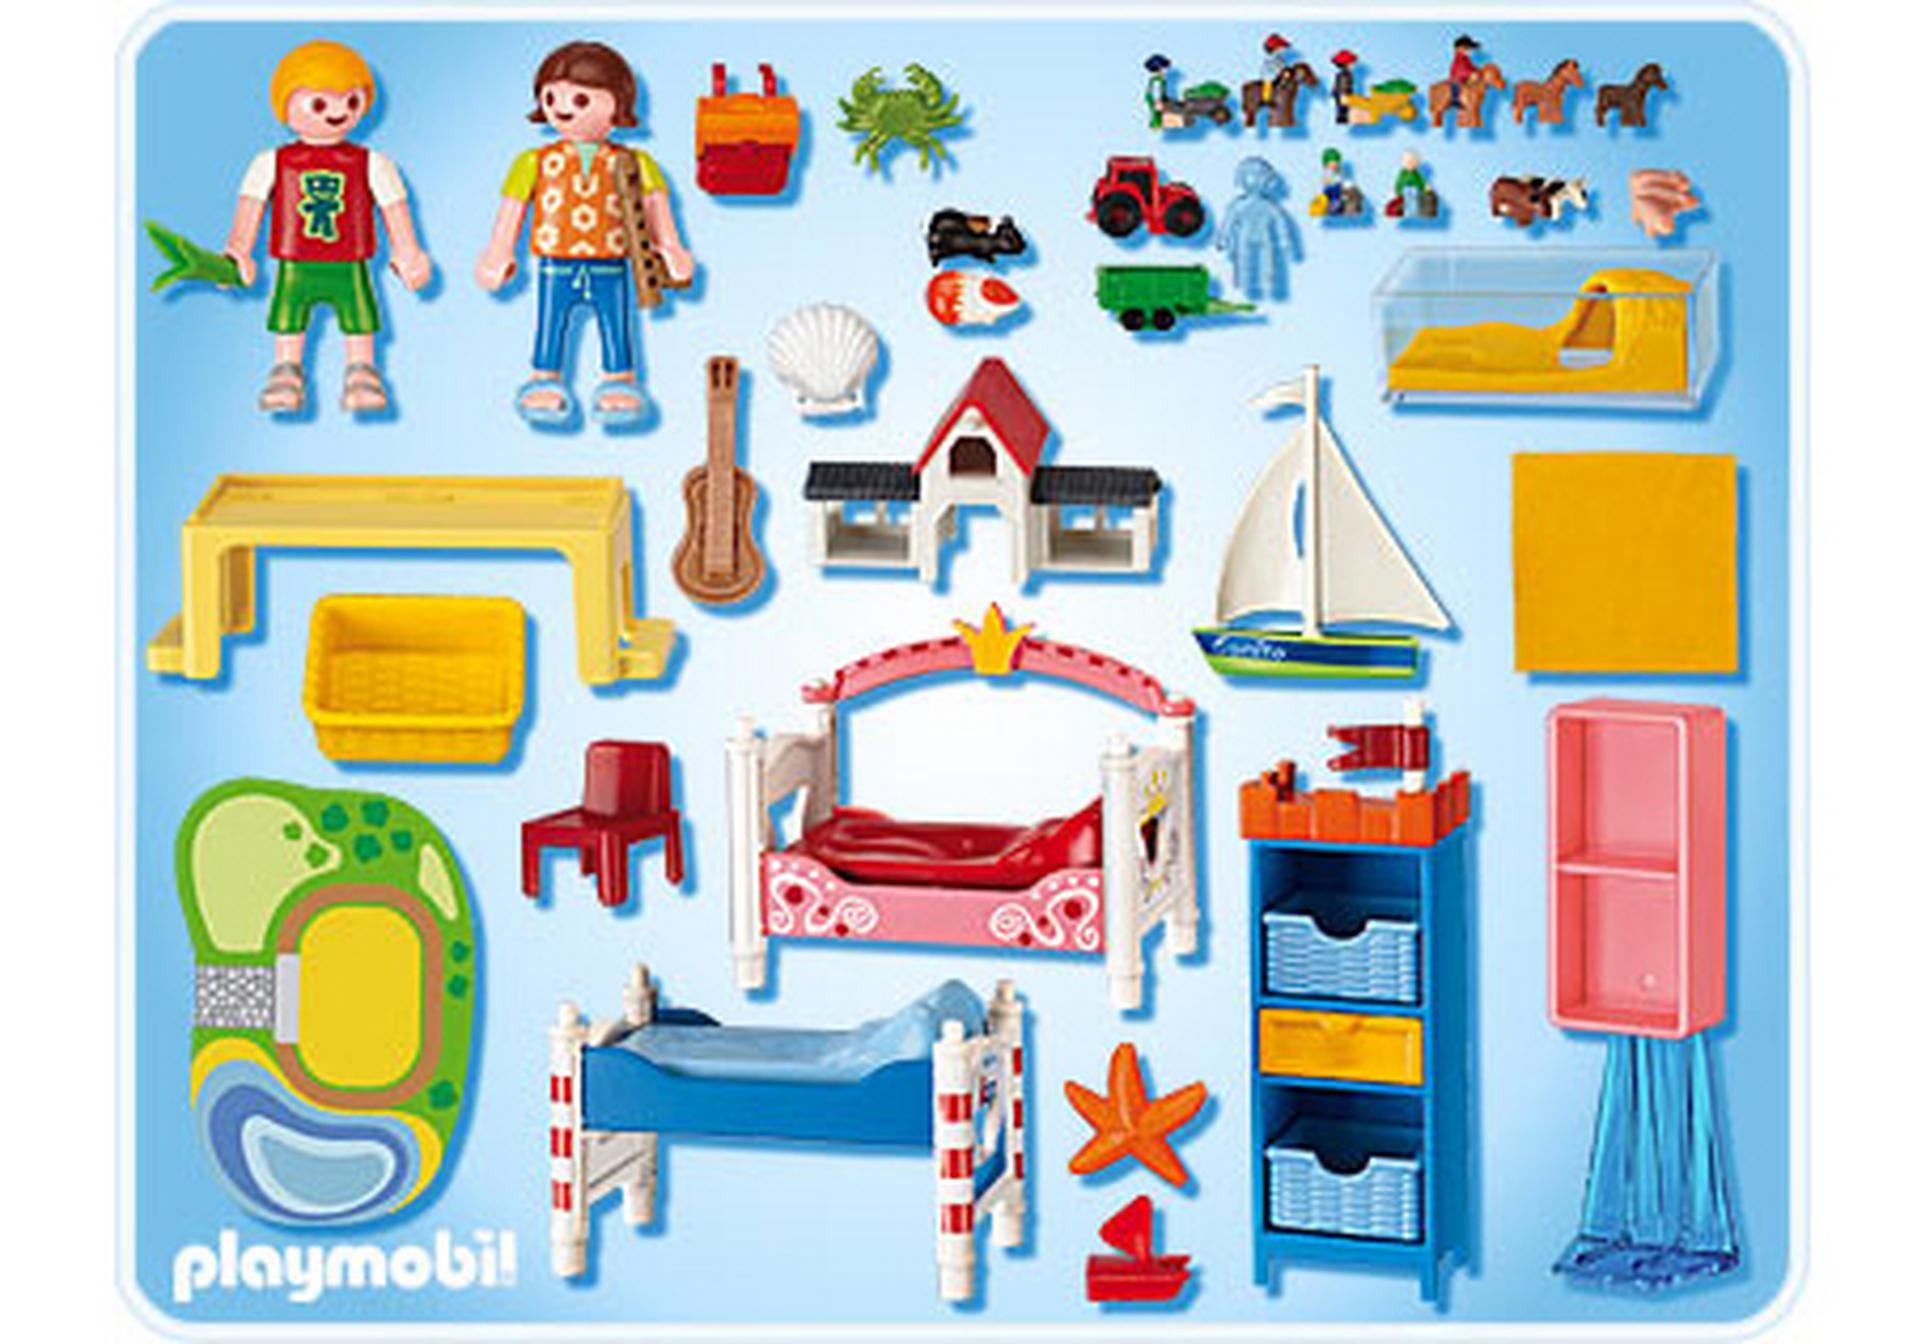 Fr hliches kinderzimmer 5333 a playmobil deutschland for La maison des bebes